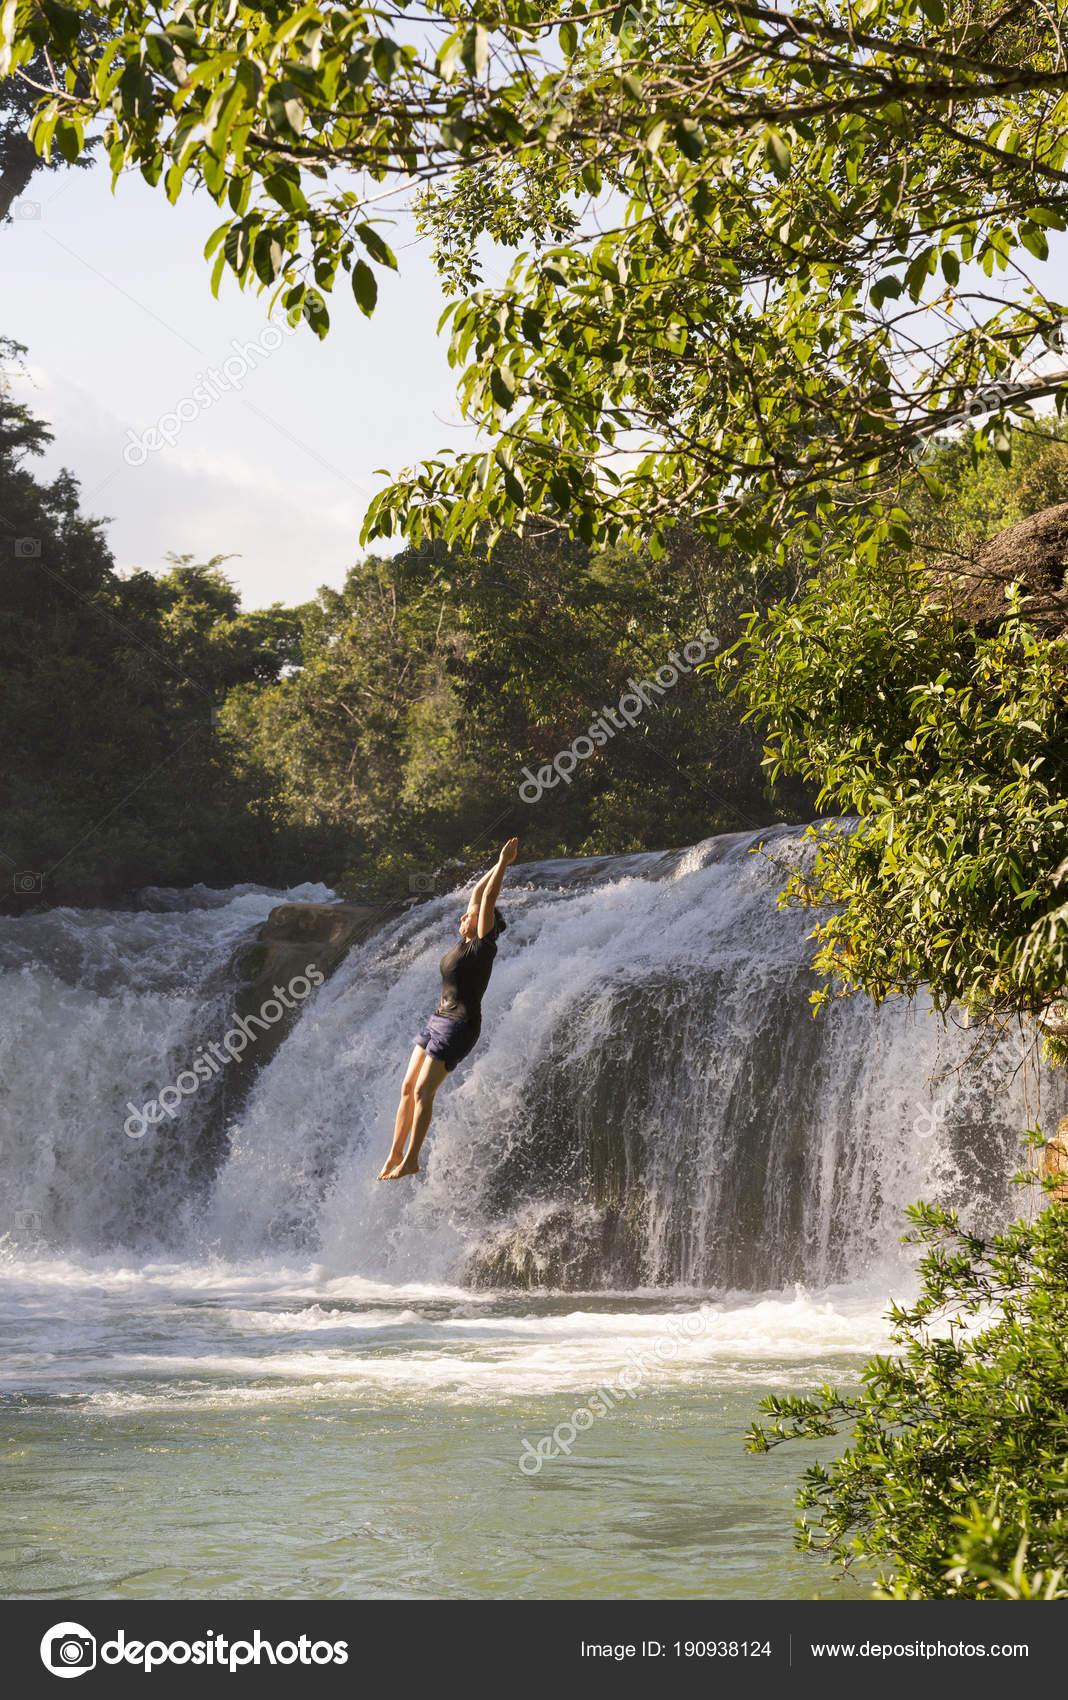 John Jumping Off A Waterfall